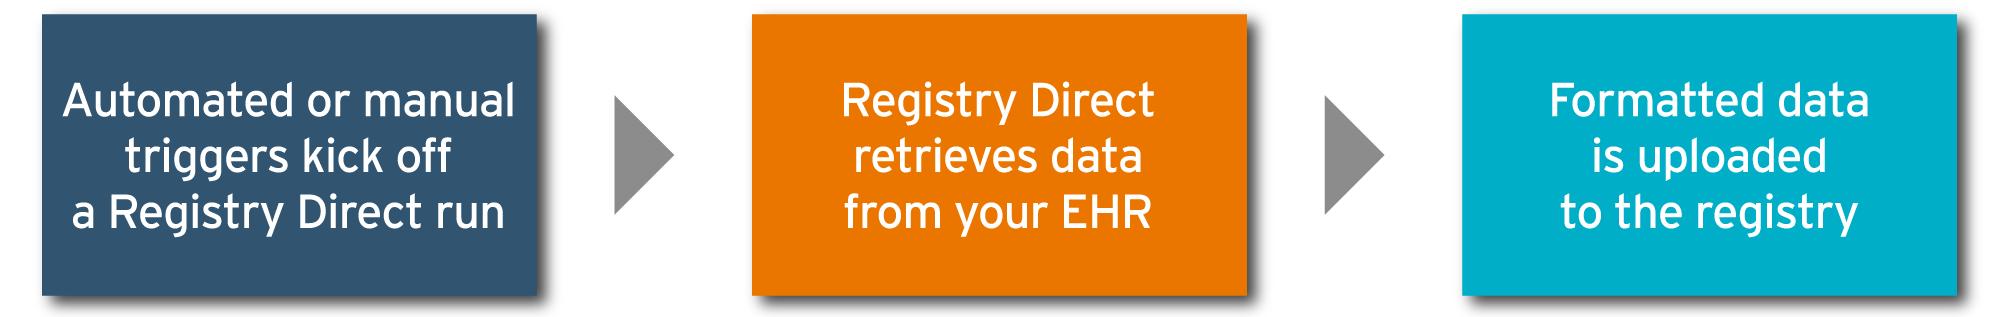 Registry Direct Data Transmission Process